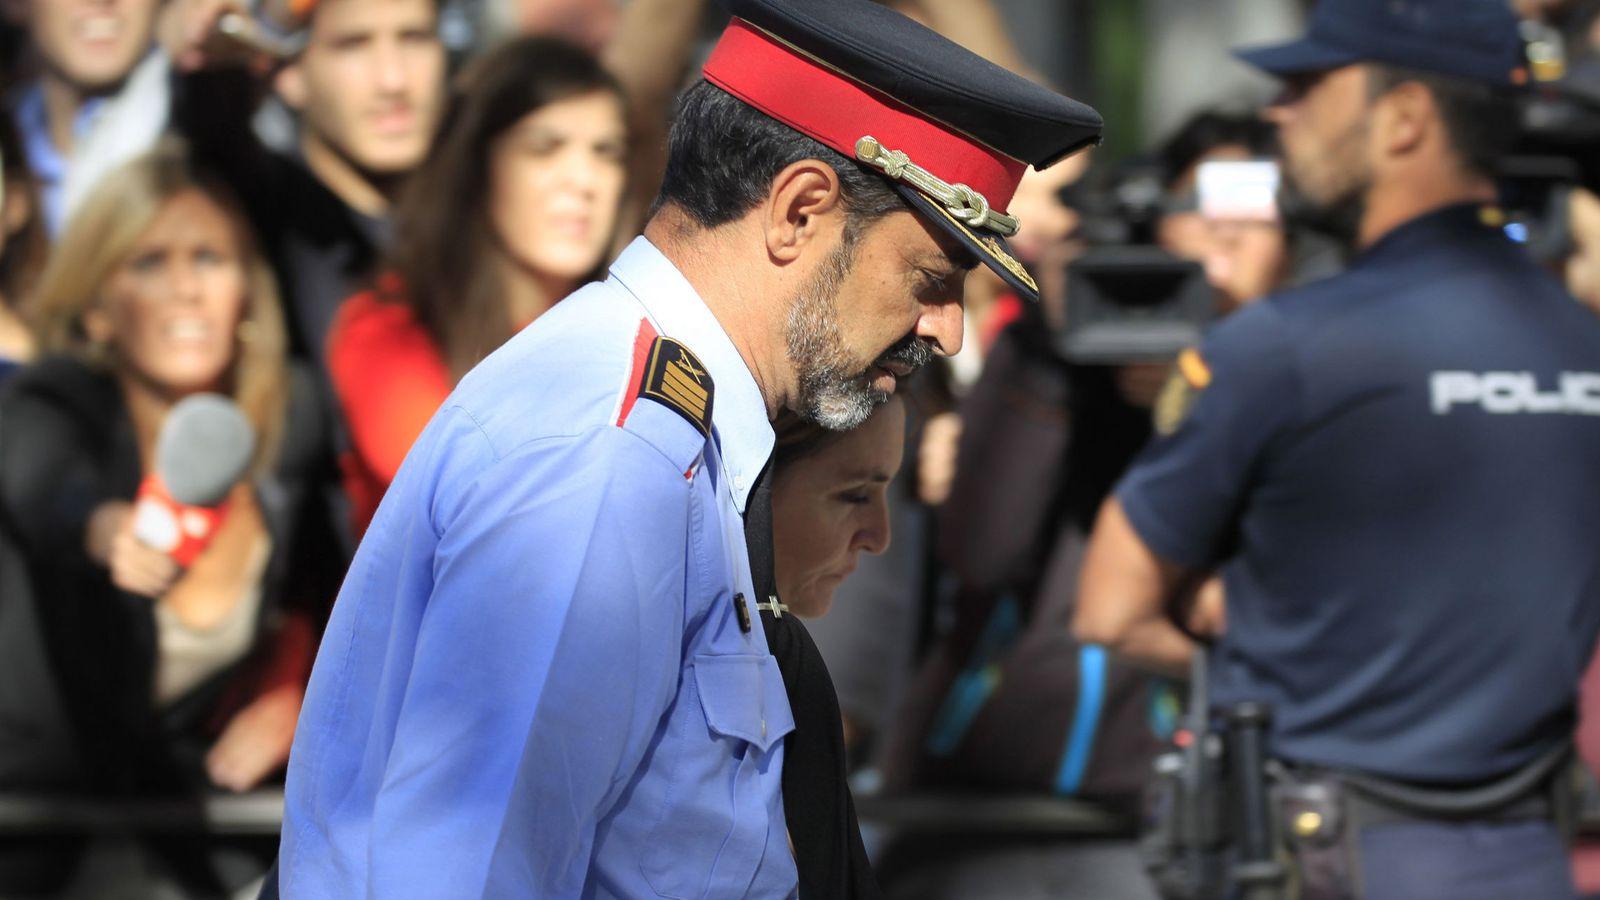 Foto: El exjefe de los Mossos d'Esquadra, Josep Lluis Trapero. (EFE)